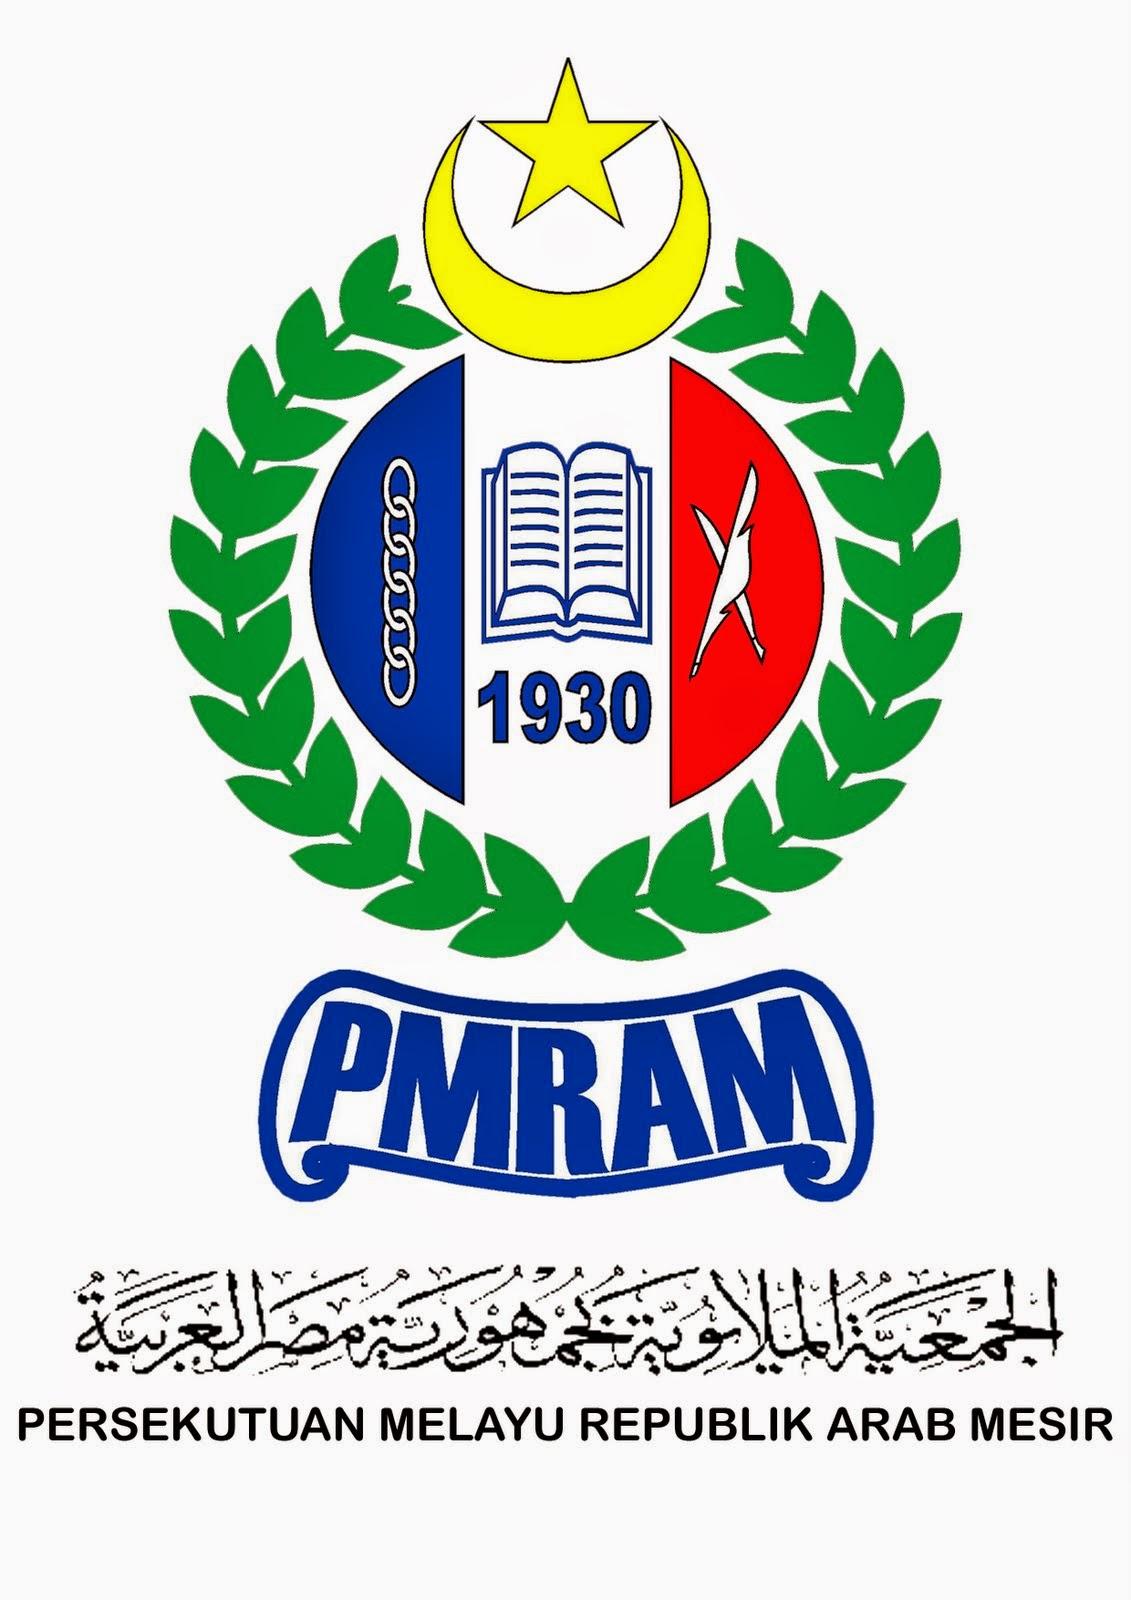 Persekutuan Melayu Republik Arab Mesir